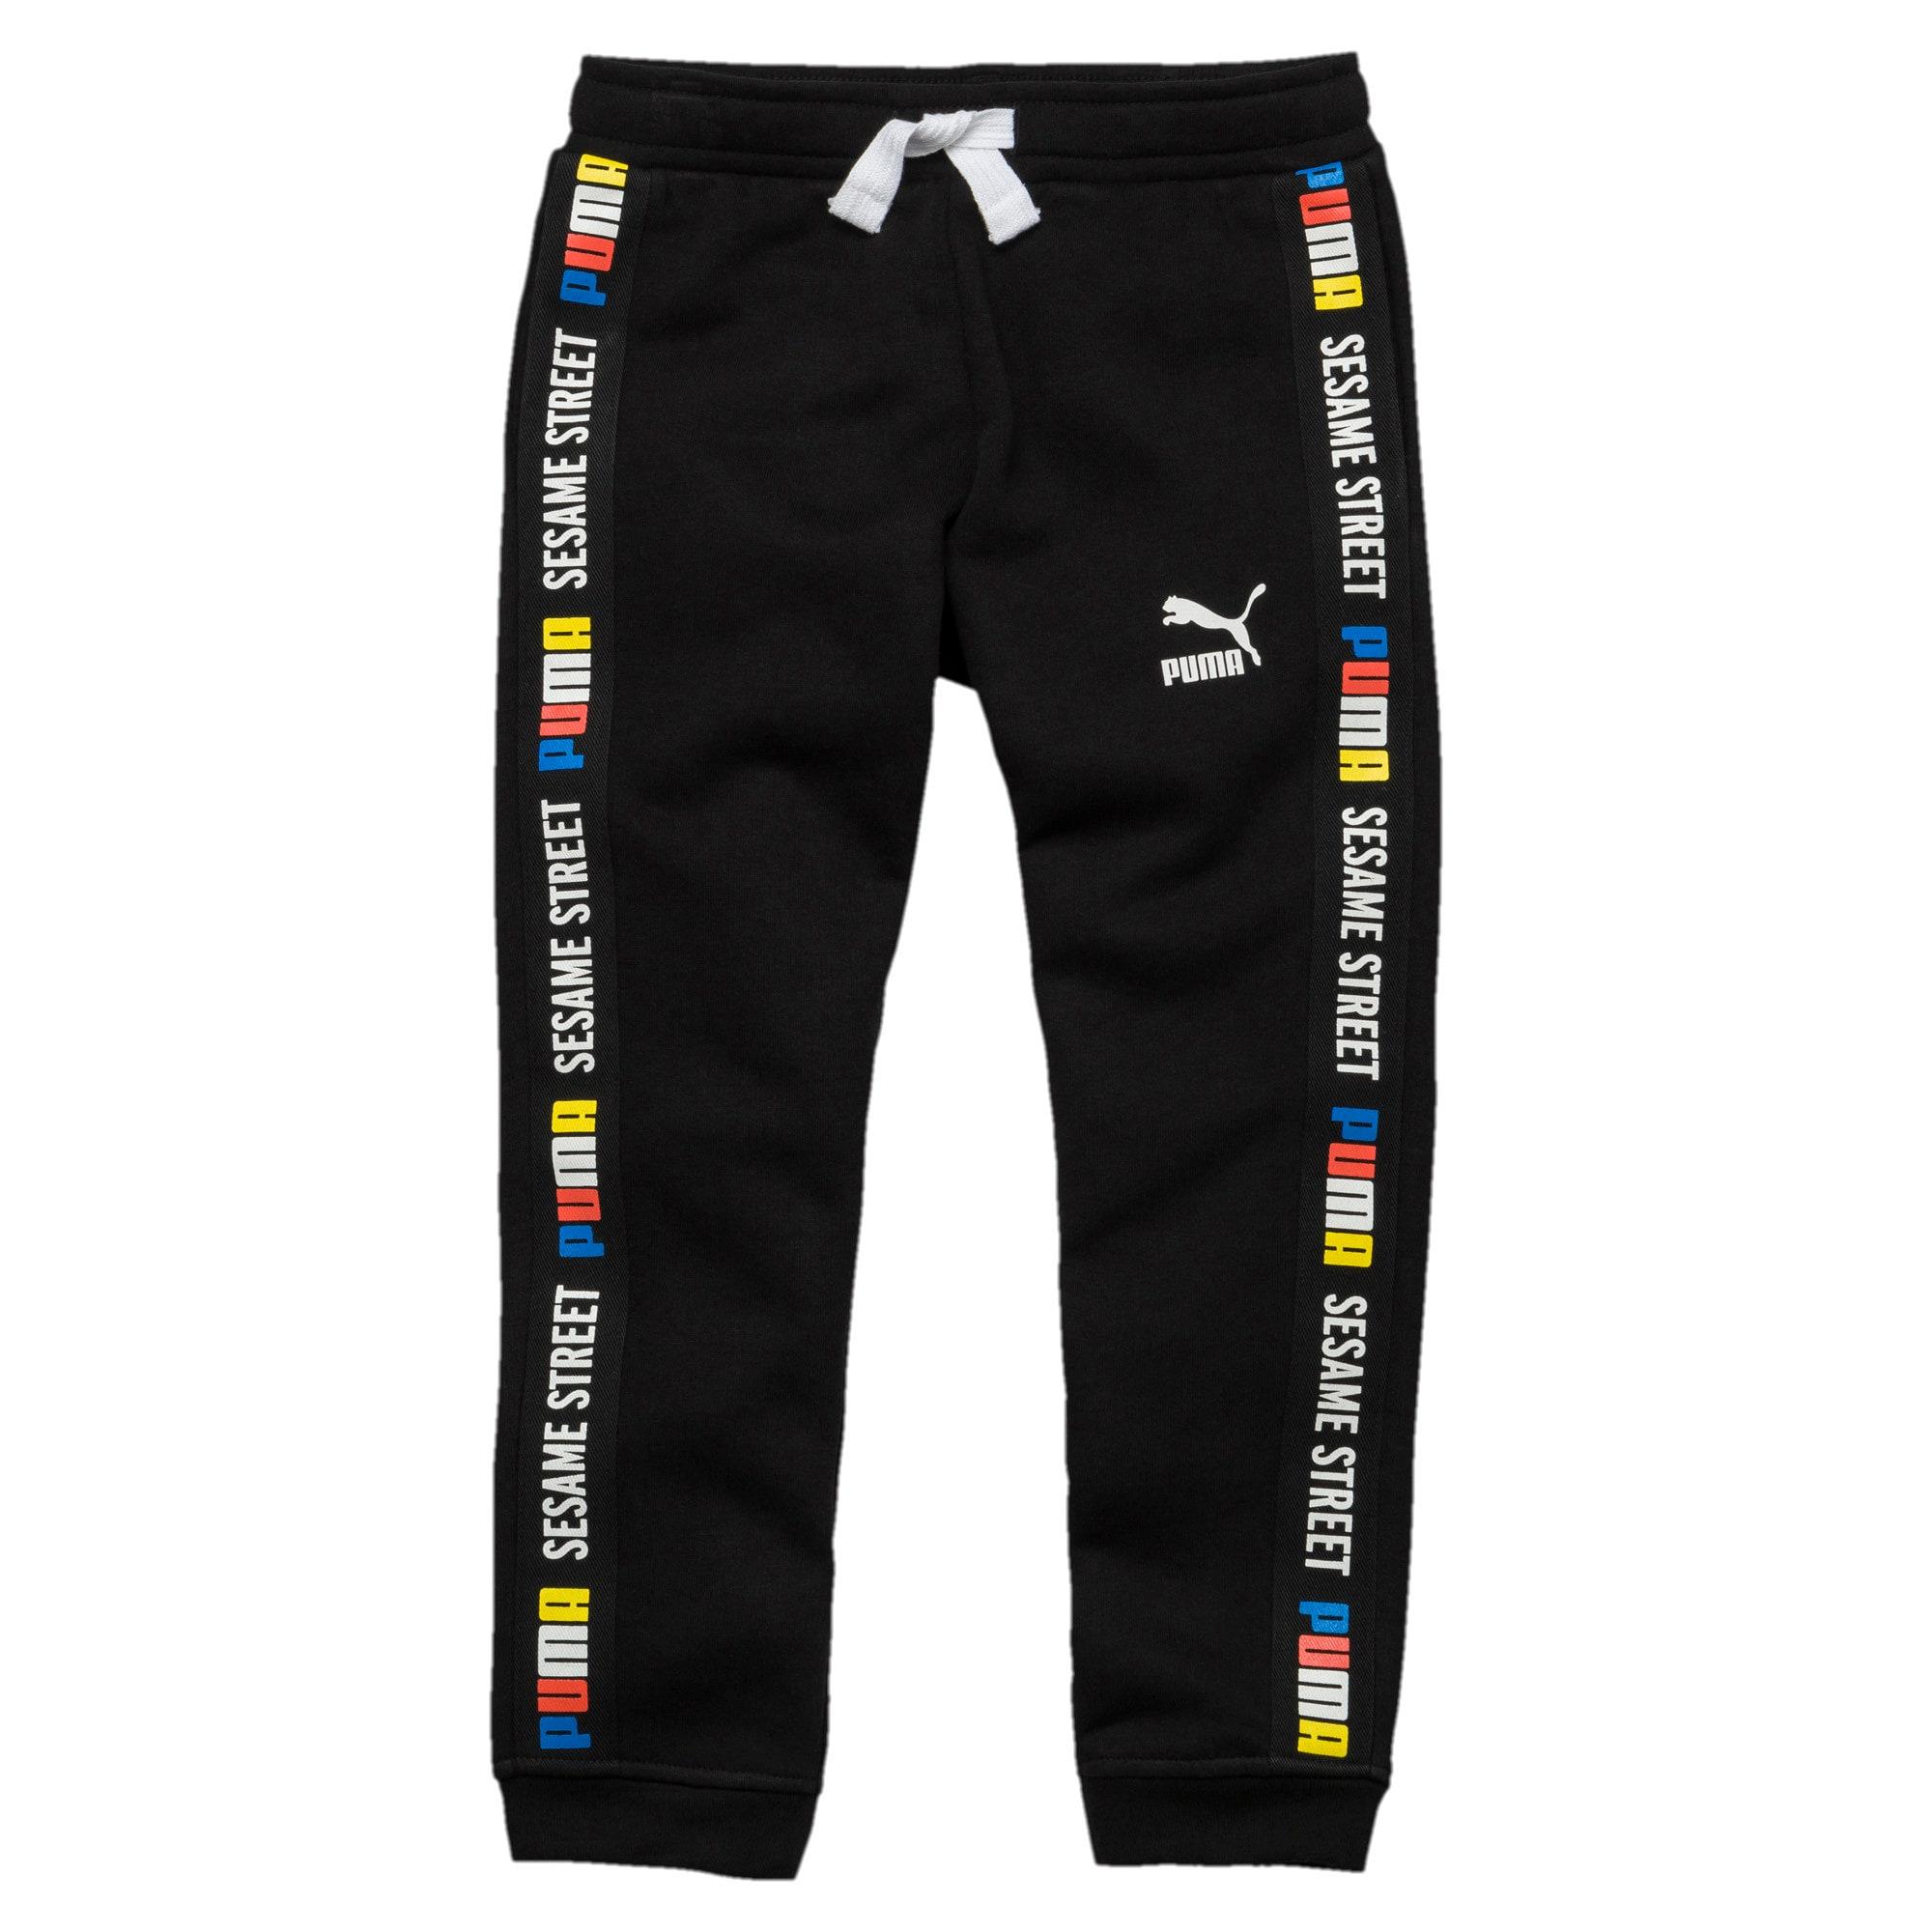 Thumbnail 1 of PUMA x SESAME STREET Boy's Sweatpants, Cotton Black, medium